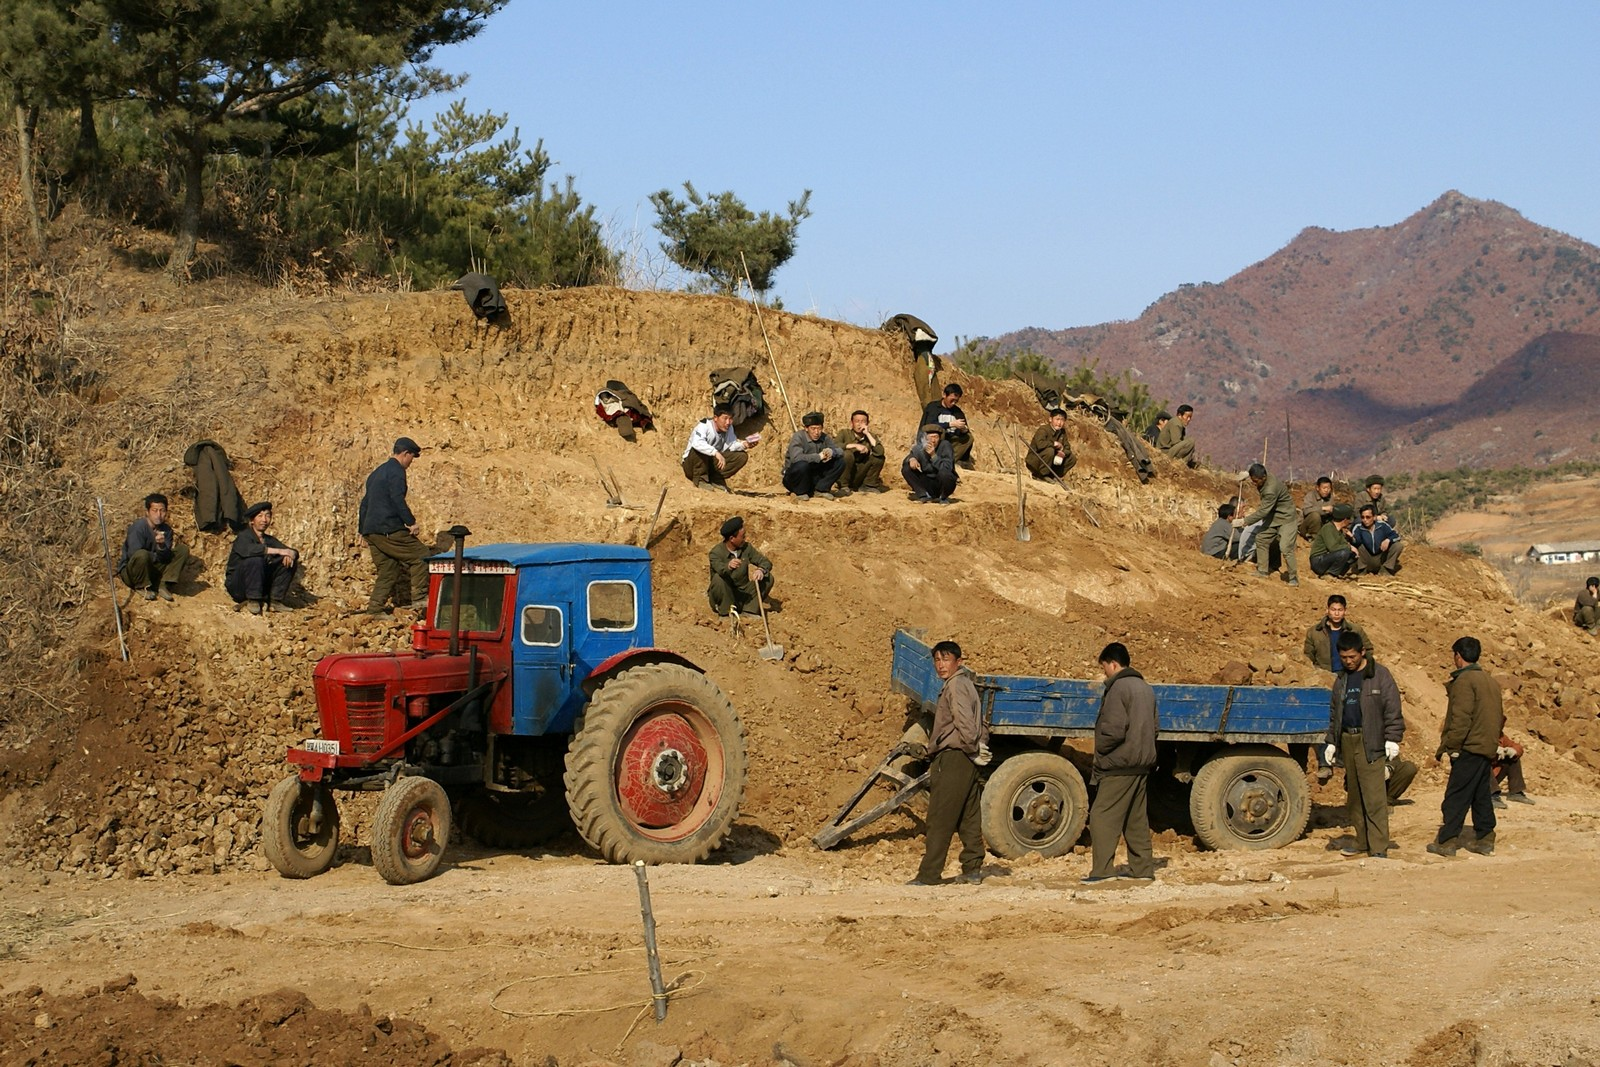 Road construction in Unjon County (1)